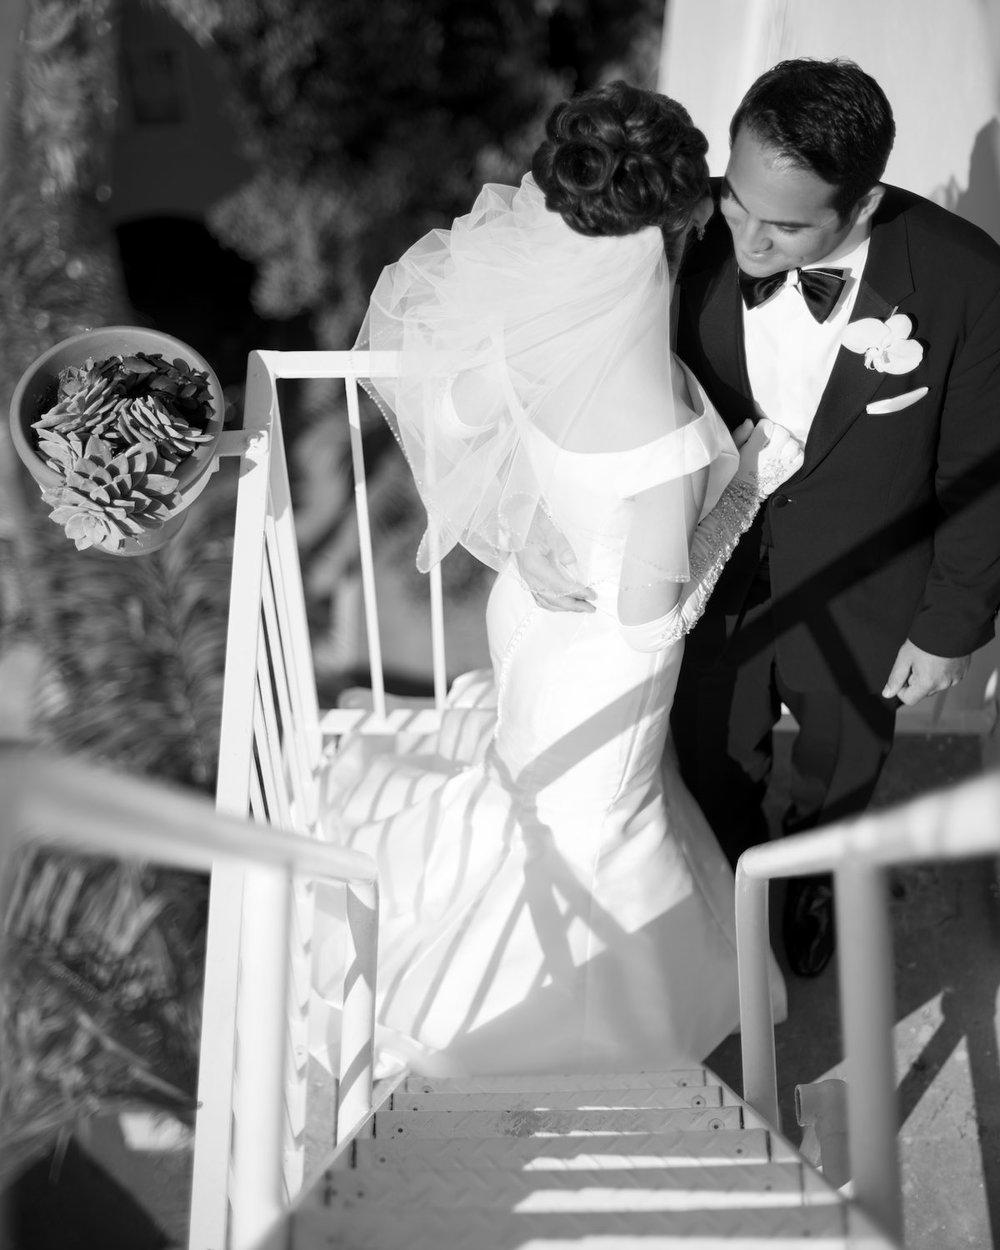 la-valencia-wedding-michal-pfeil-25.jpg